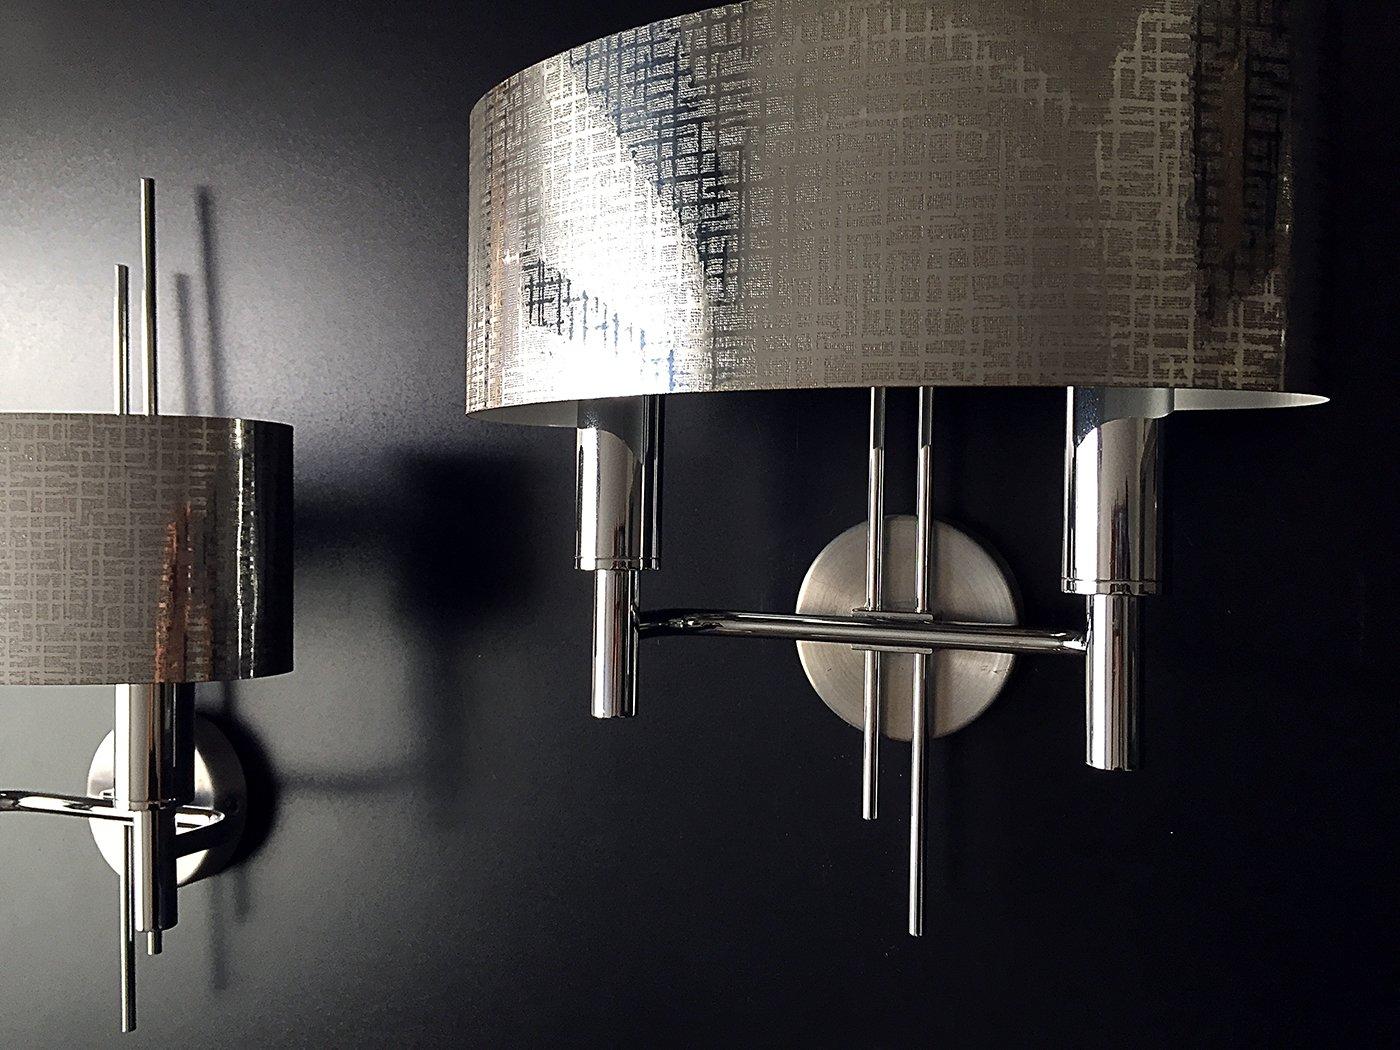 appliques m talliques par gaetano sciolari 1970s set de 2 en vente sur pamono. Black Bedroom Furniture Sets. Home Design Ideas